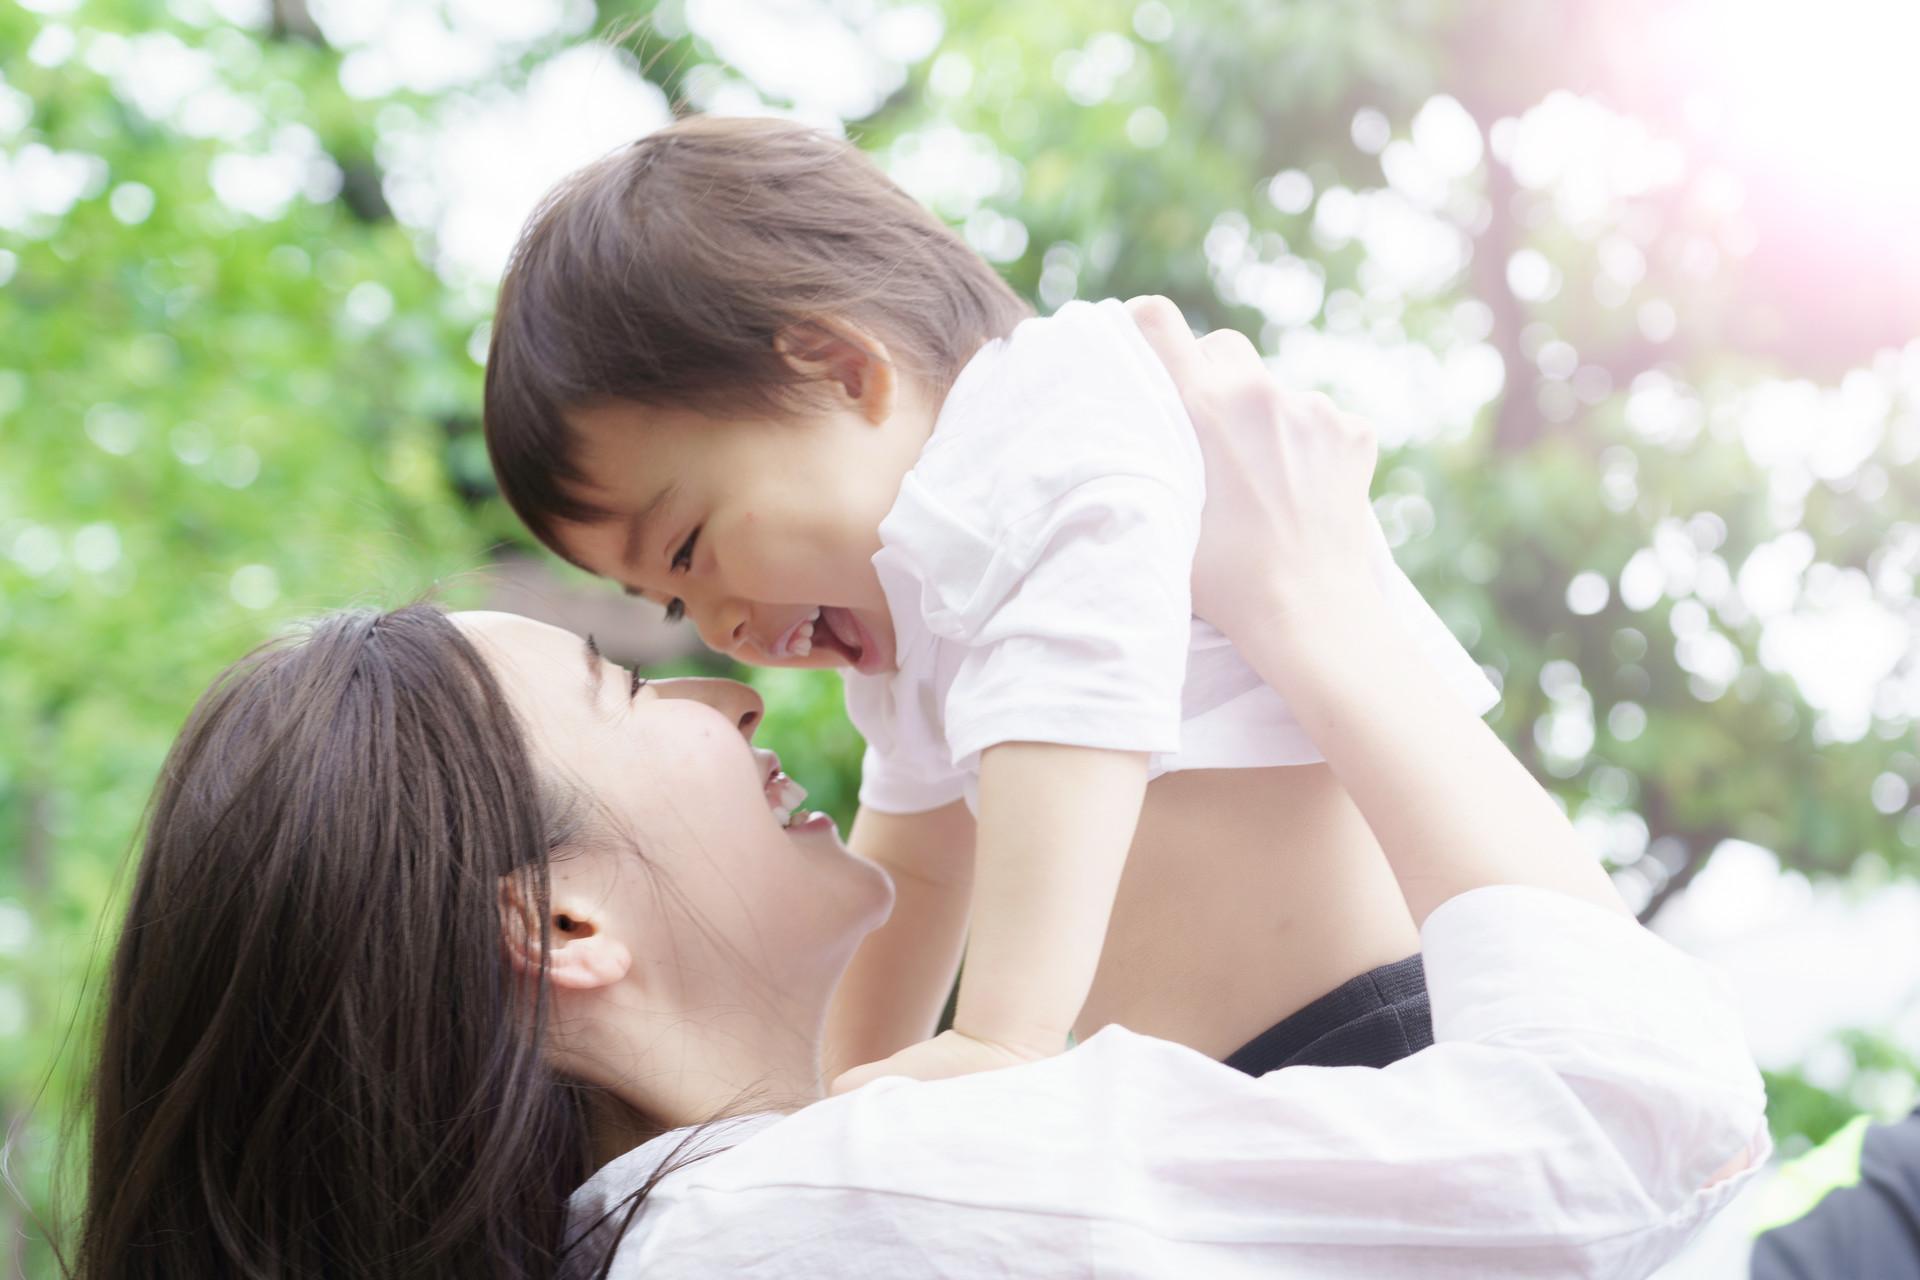 <br><h4>나의 치료가 가족의 삶에 영향을 주지 않는 사회</h4>